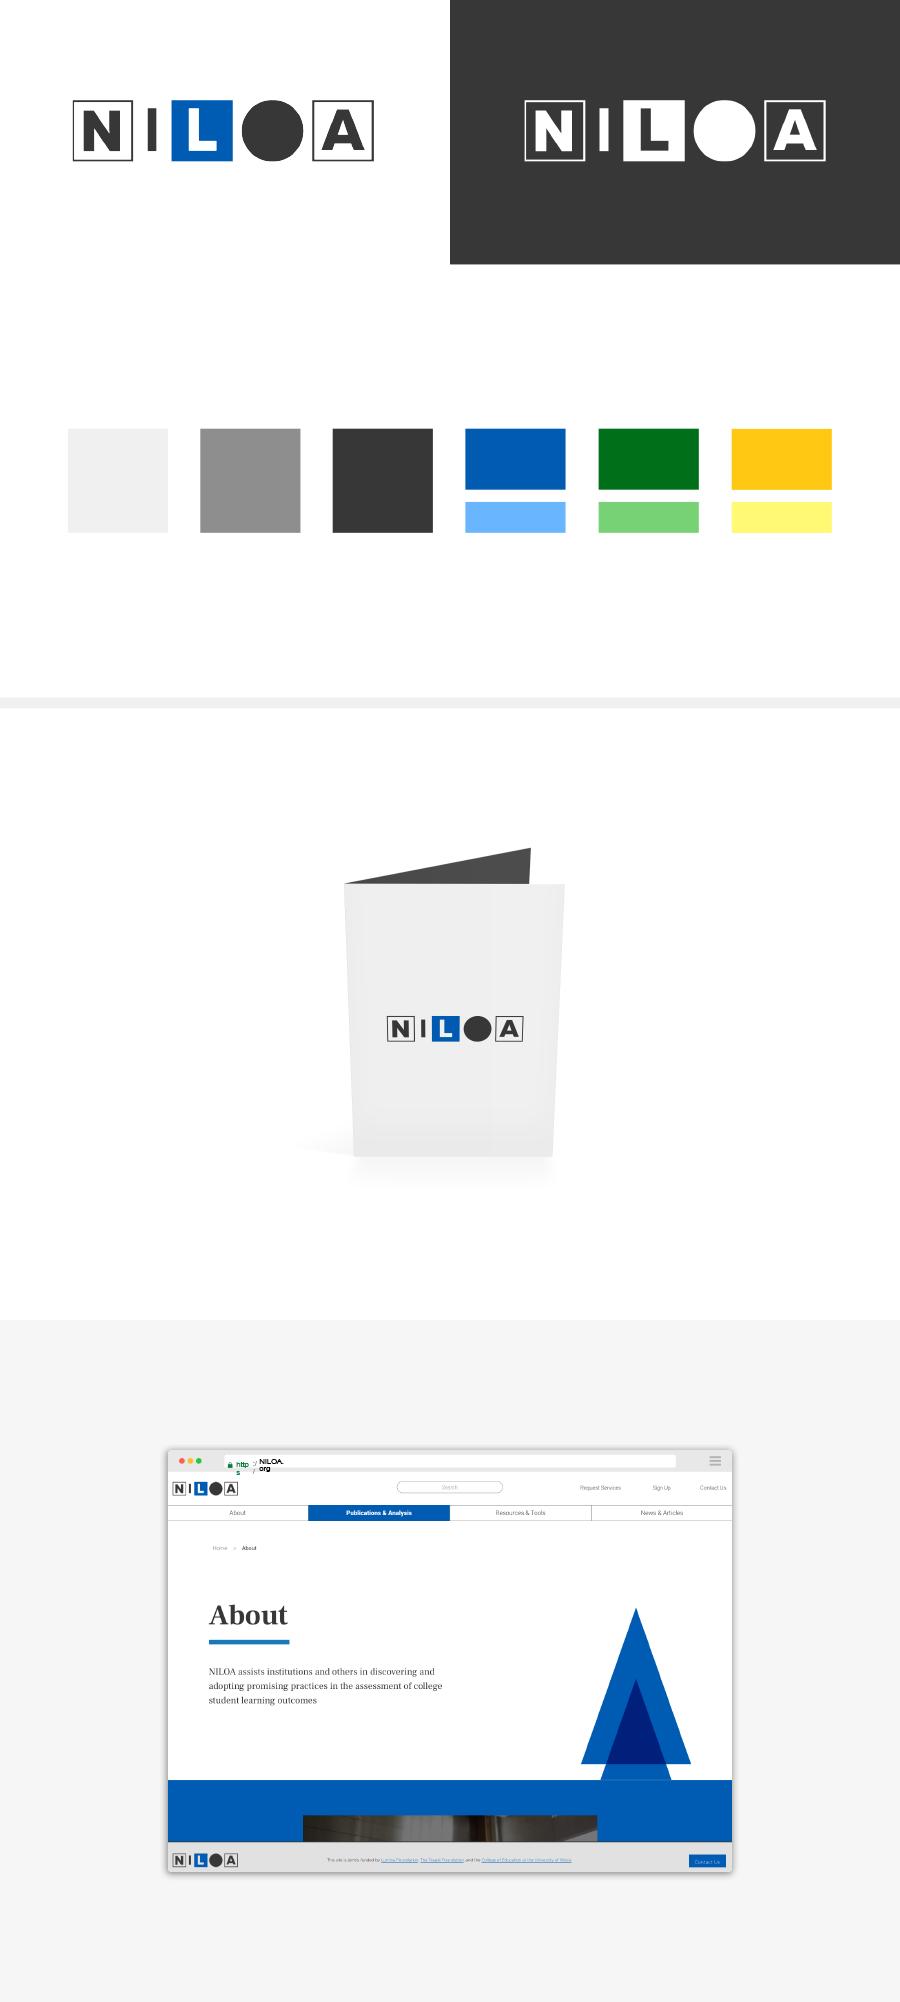 Niloa Logo and Styles